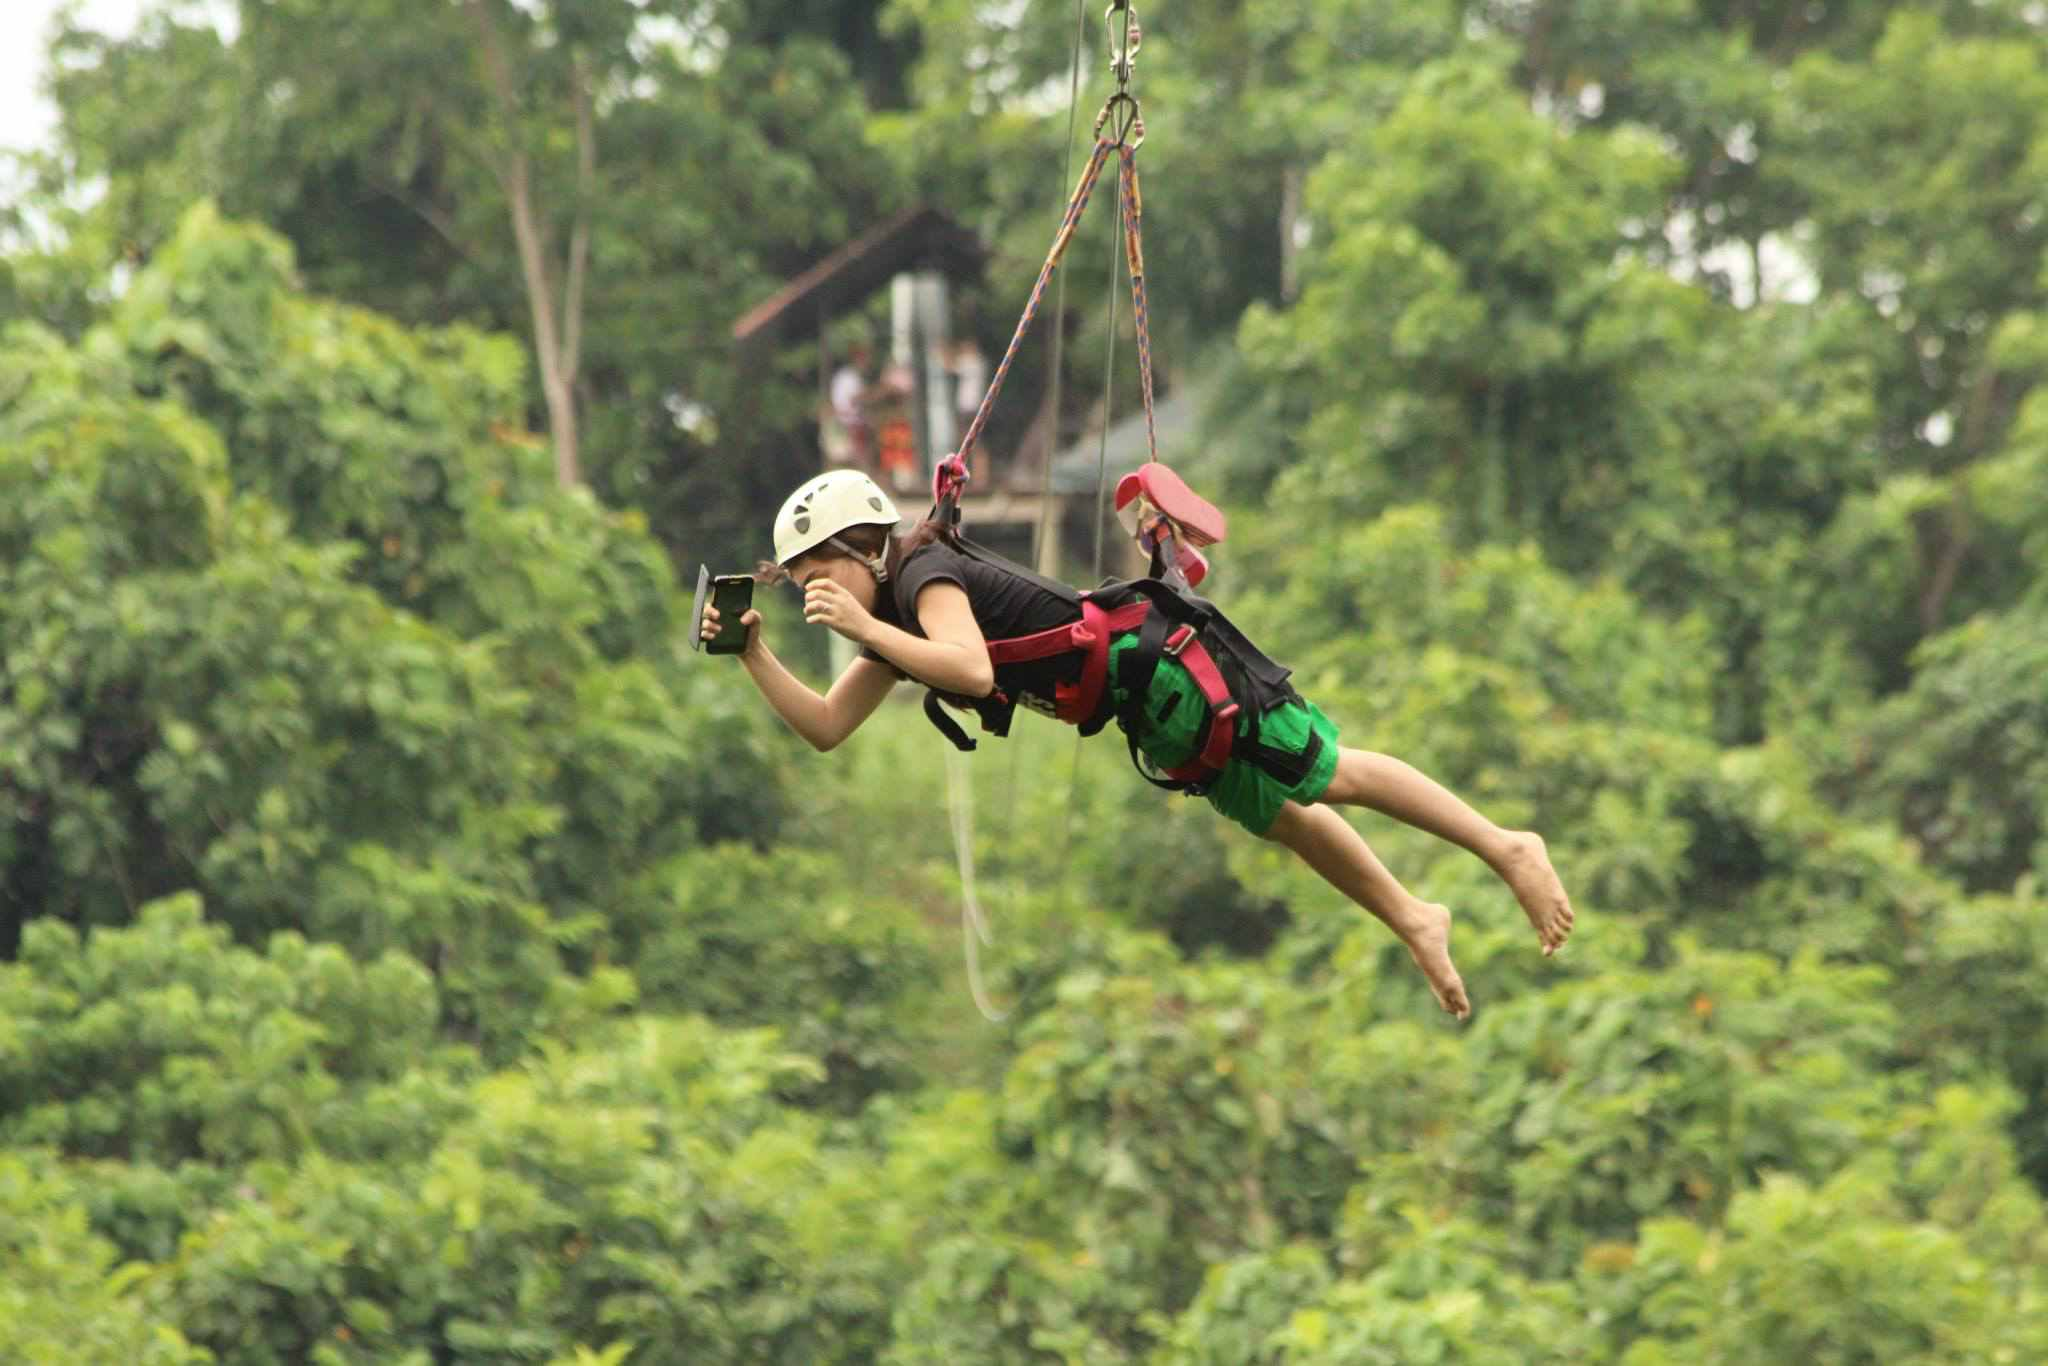 Zipline at Outland Adventure